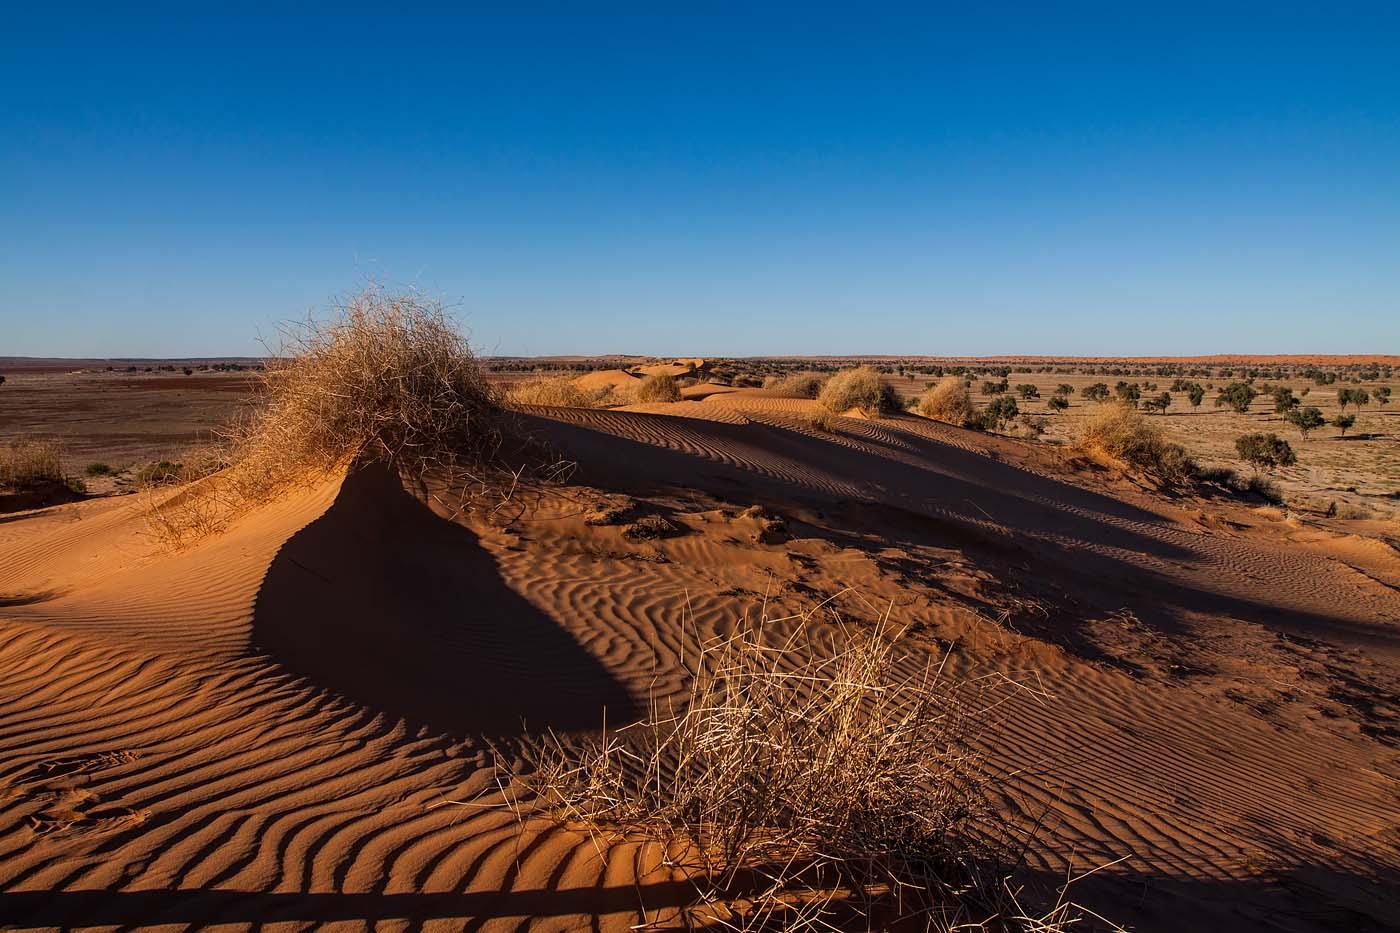 Desert landscapes. Fine art images by Brad Baker Photography